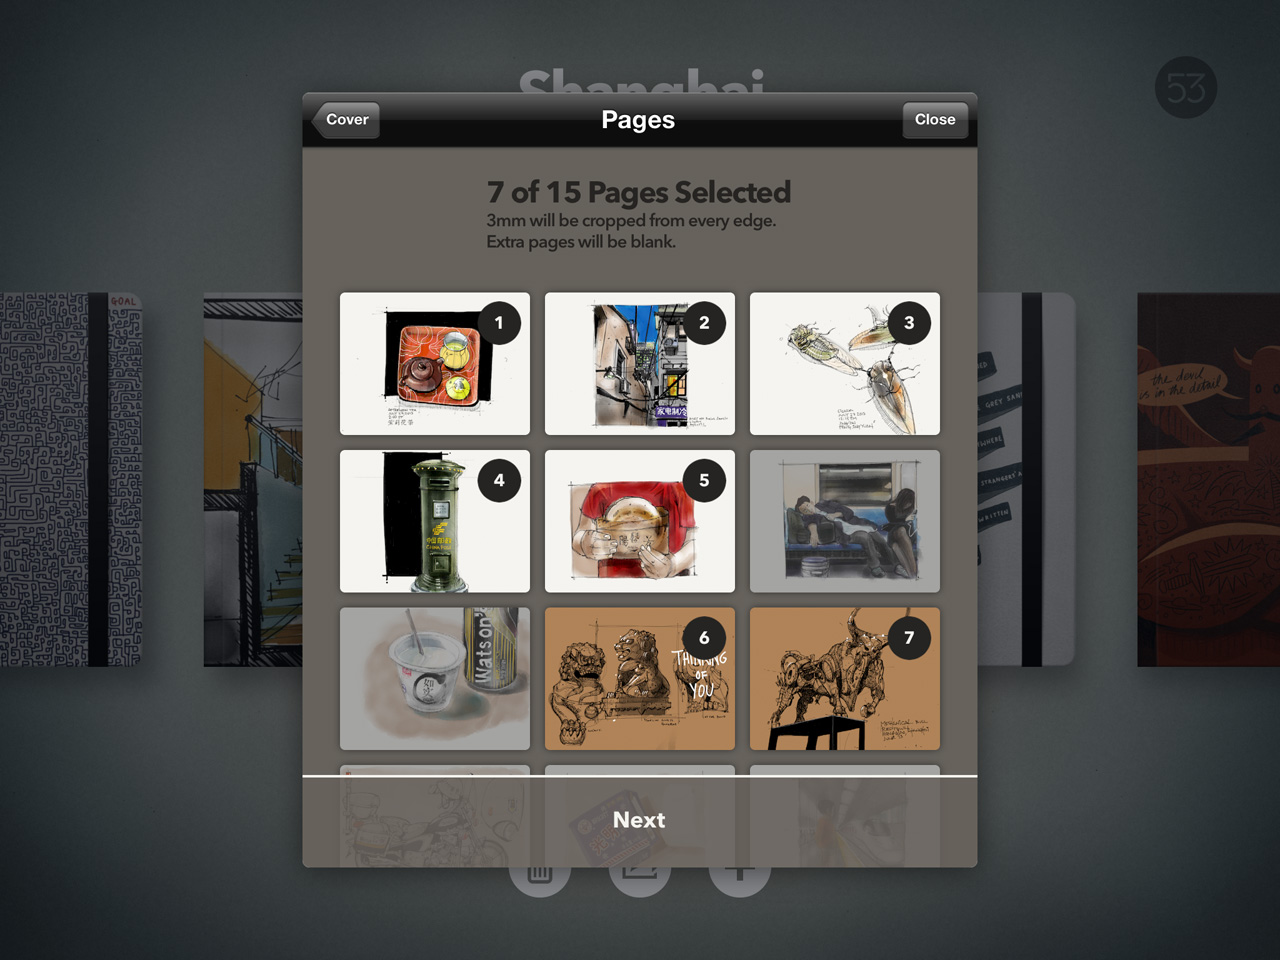 Book-FiftyThree-Moleskin-6-app